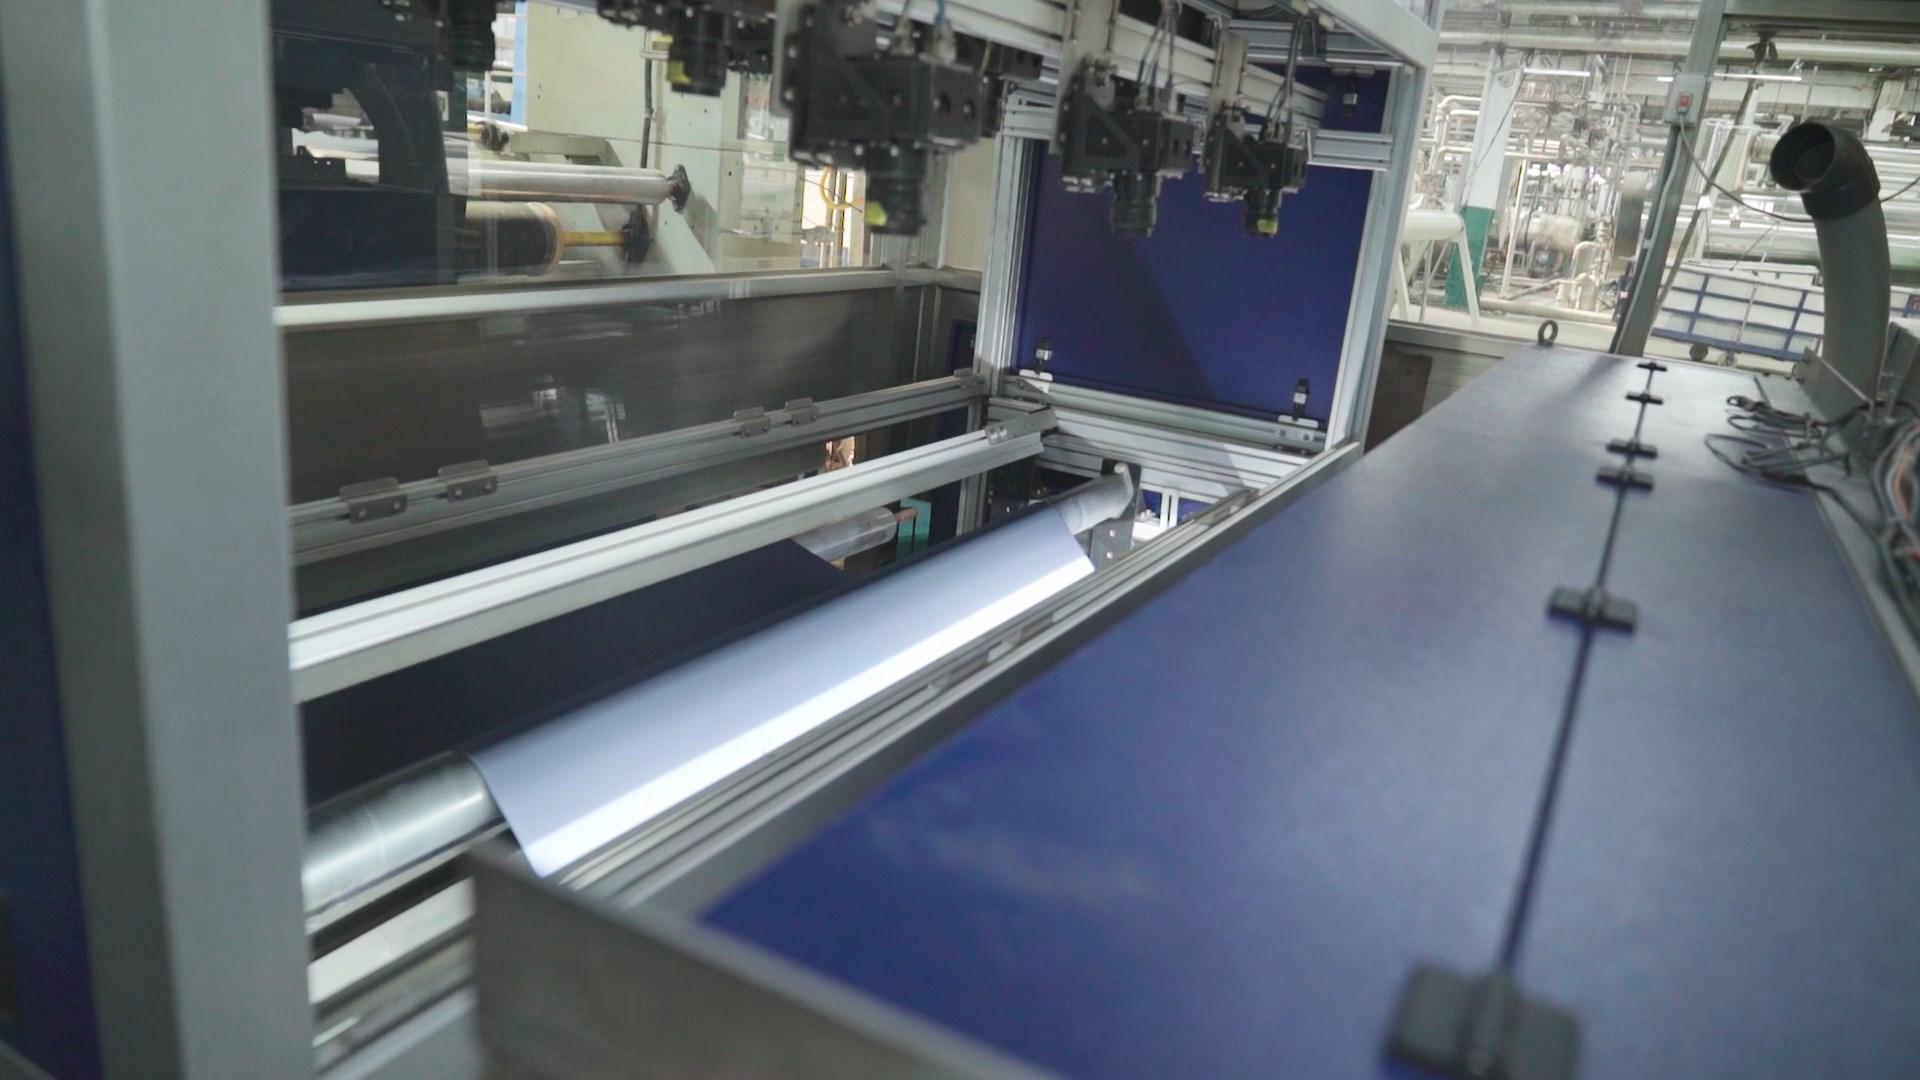 TAIS自動驗布系統透過鏡頭即可辨識出瑕疵,並可將資料直接傳給成衣廠,節省了不少驗布的時間。